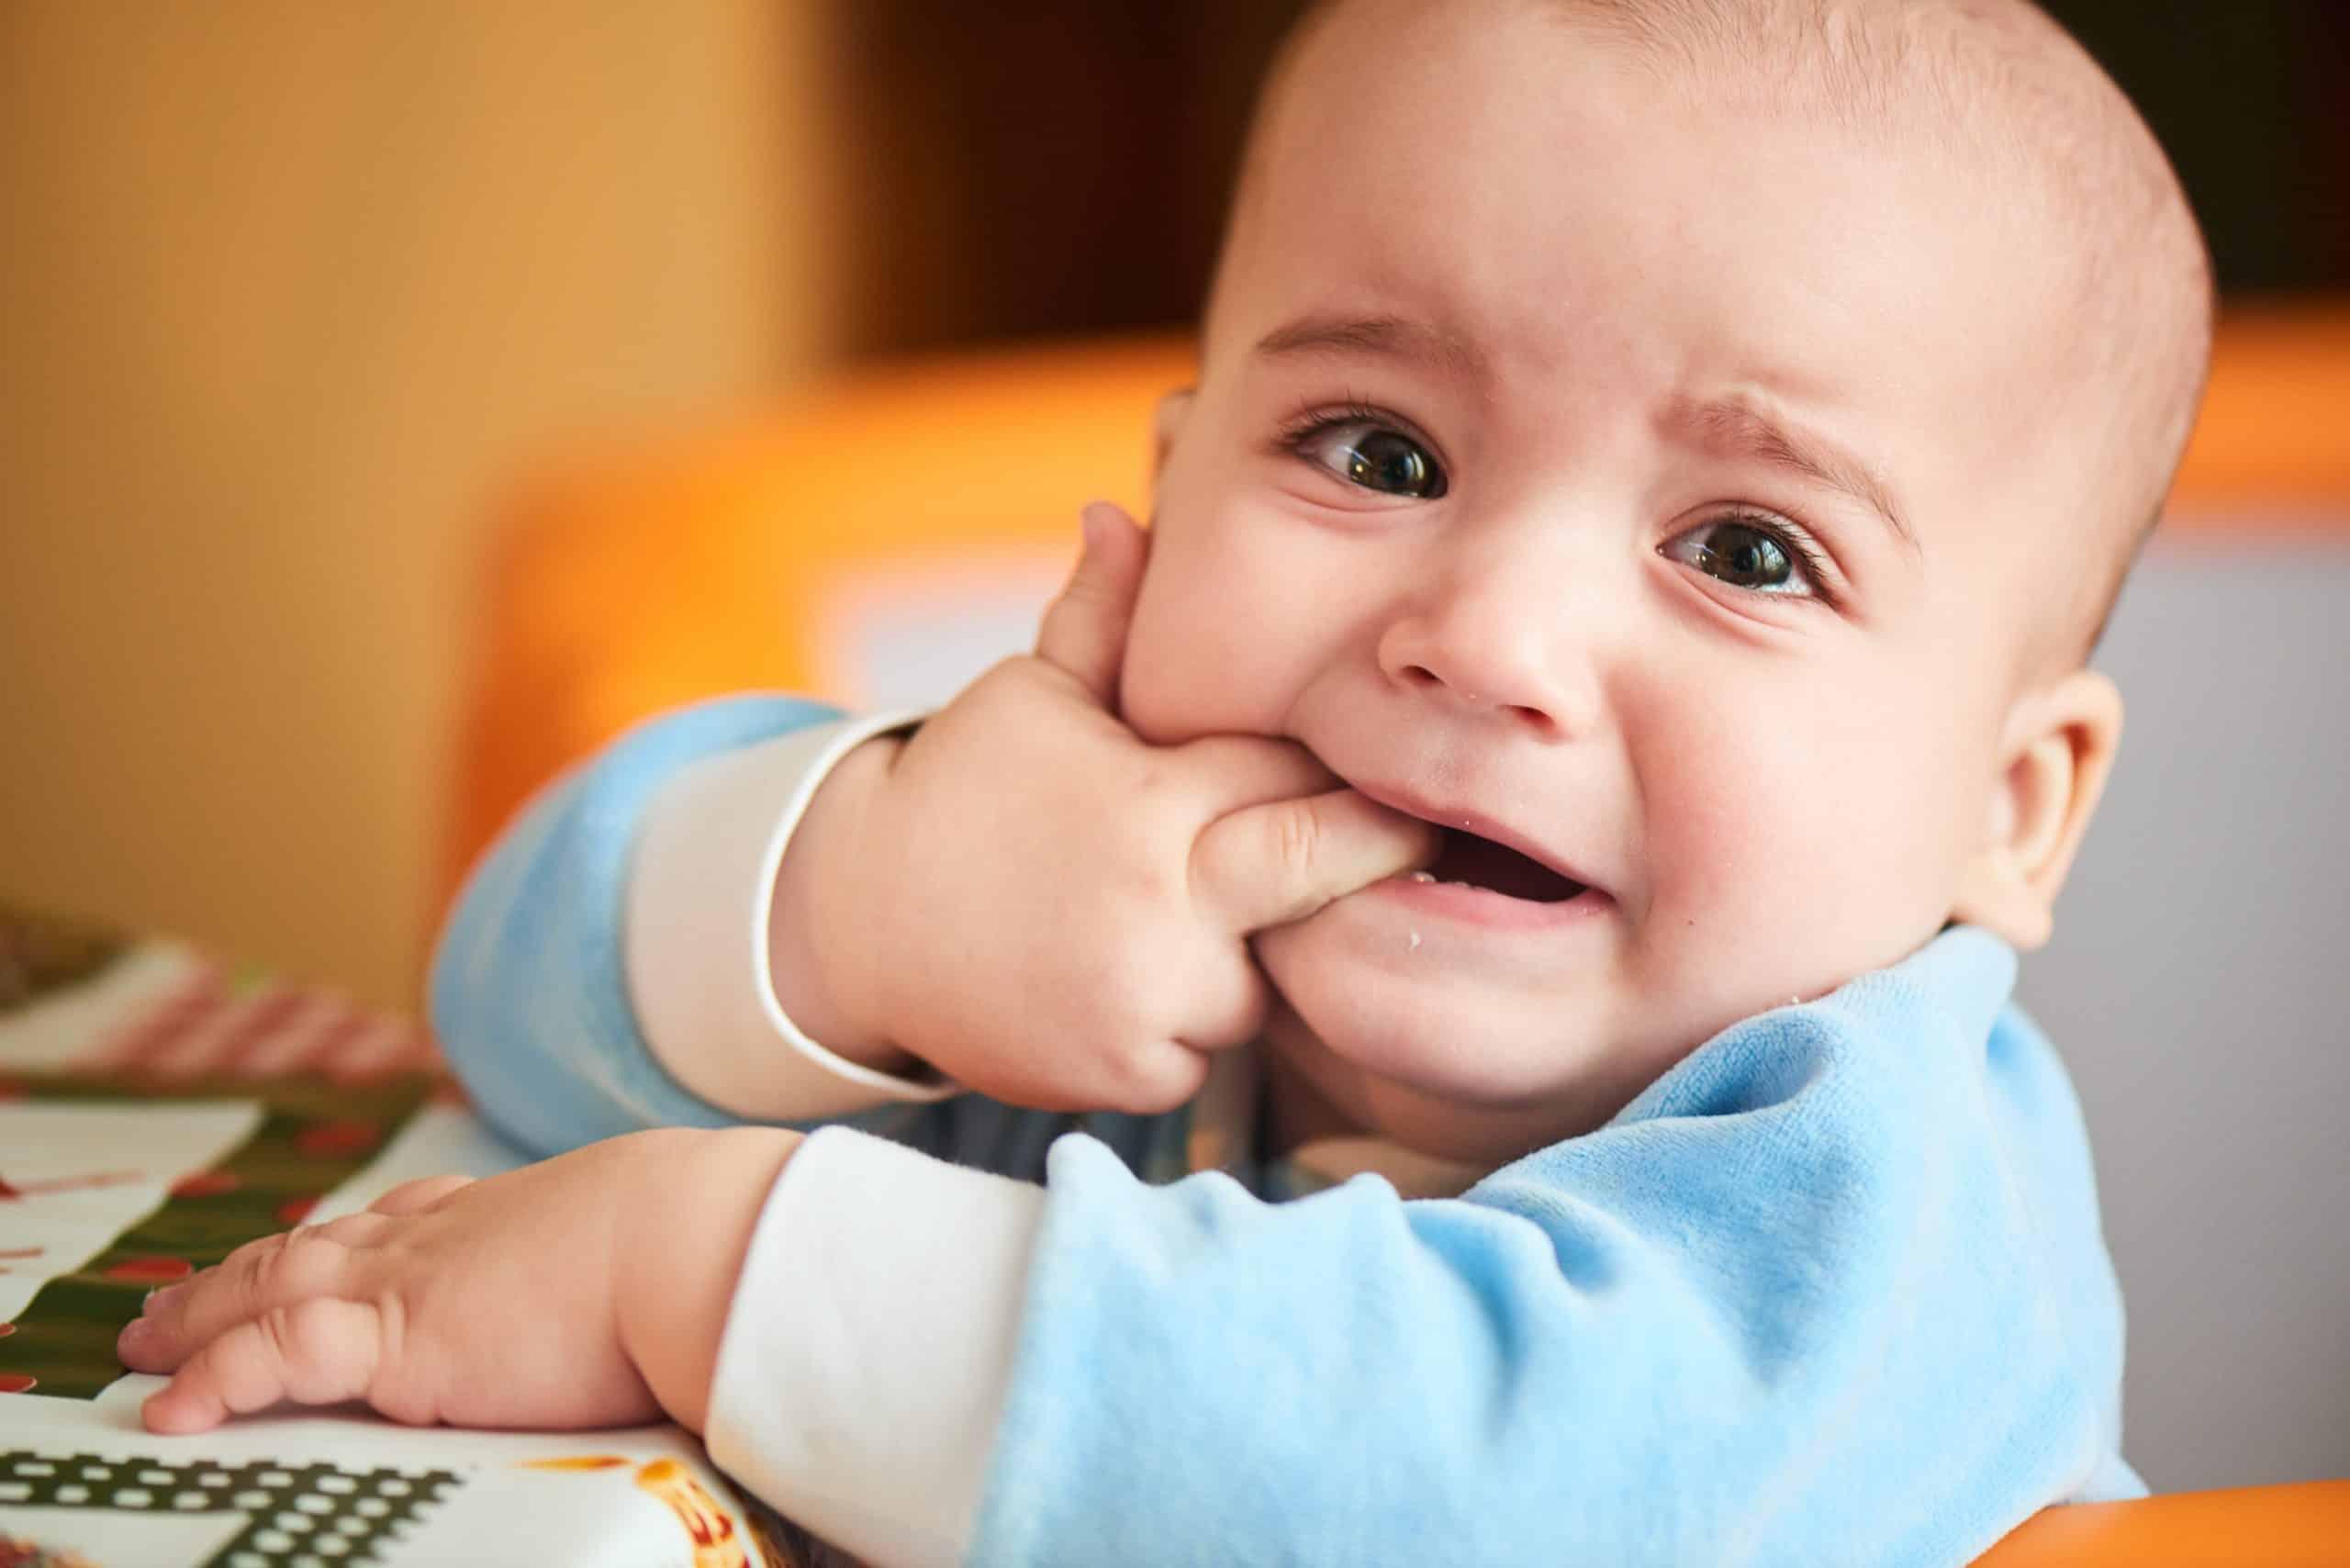 when do babies start teething